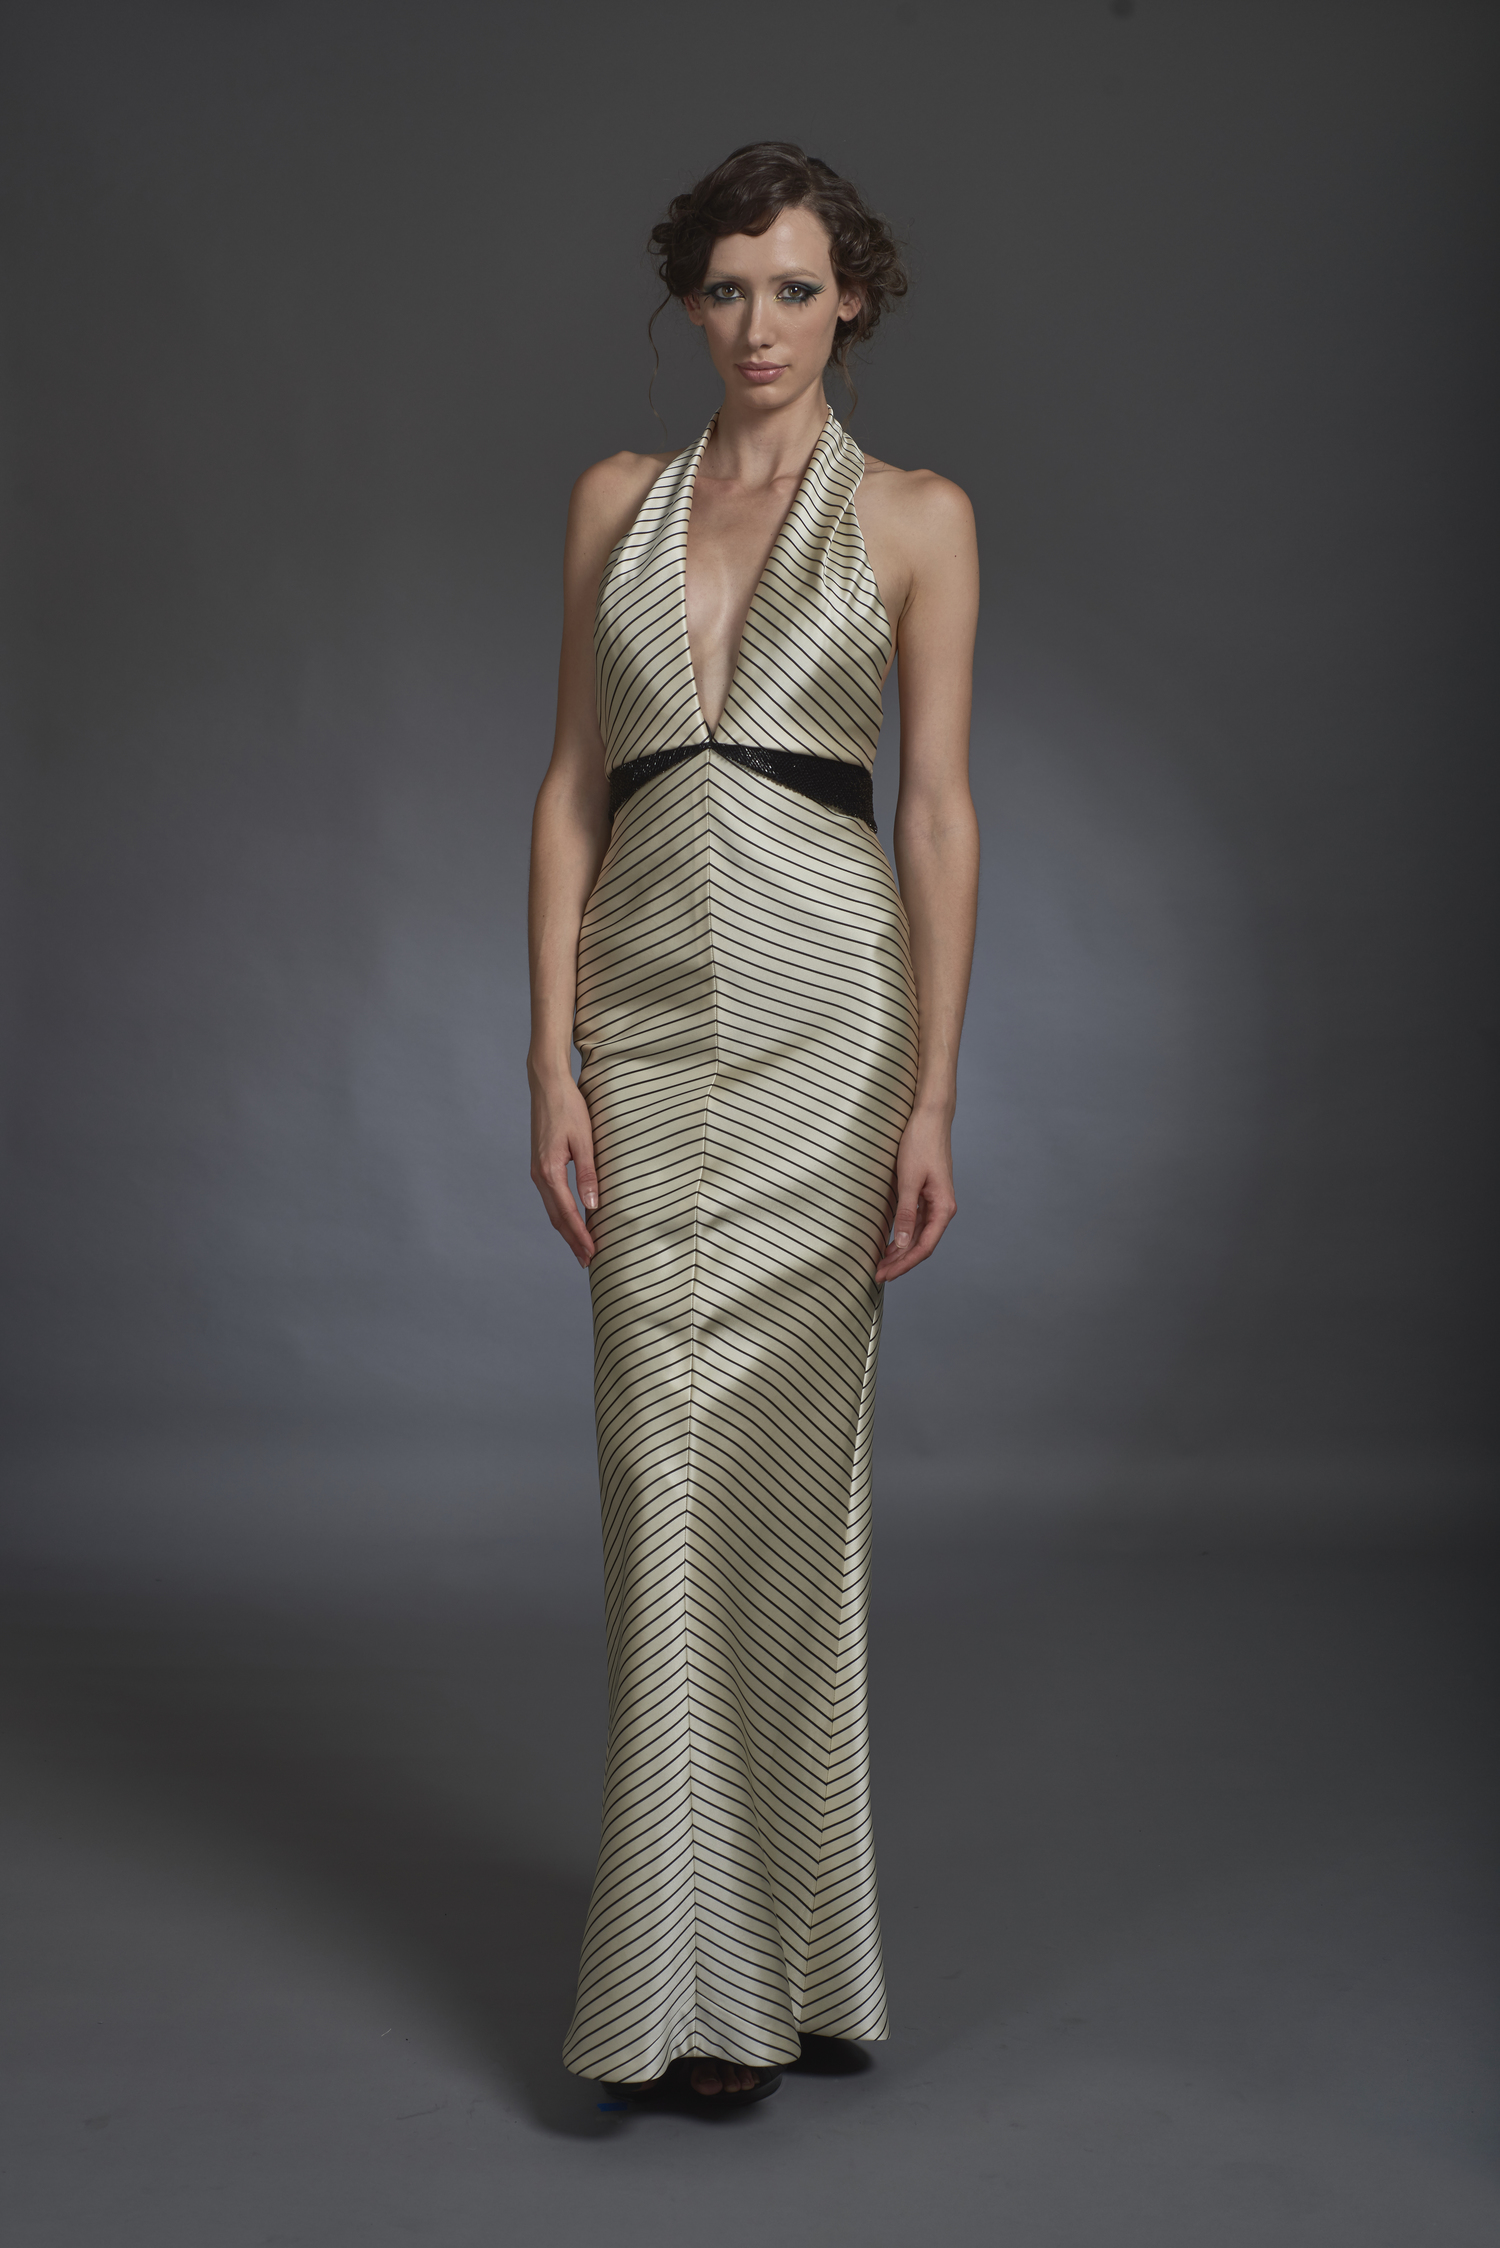 Black and White Halter Gown — Globa Moda